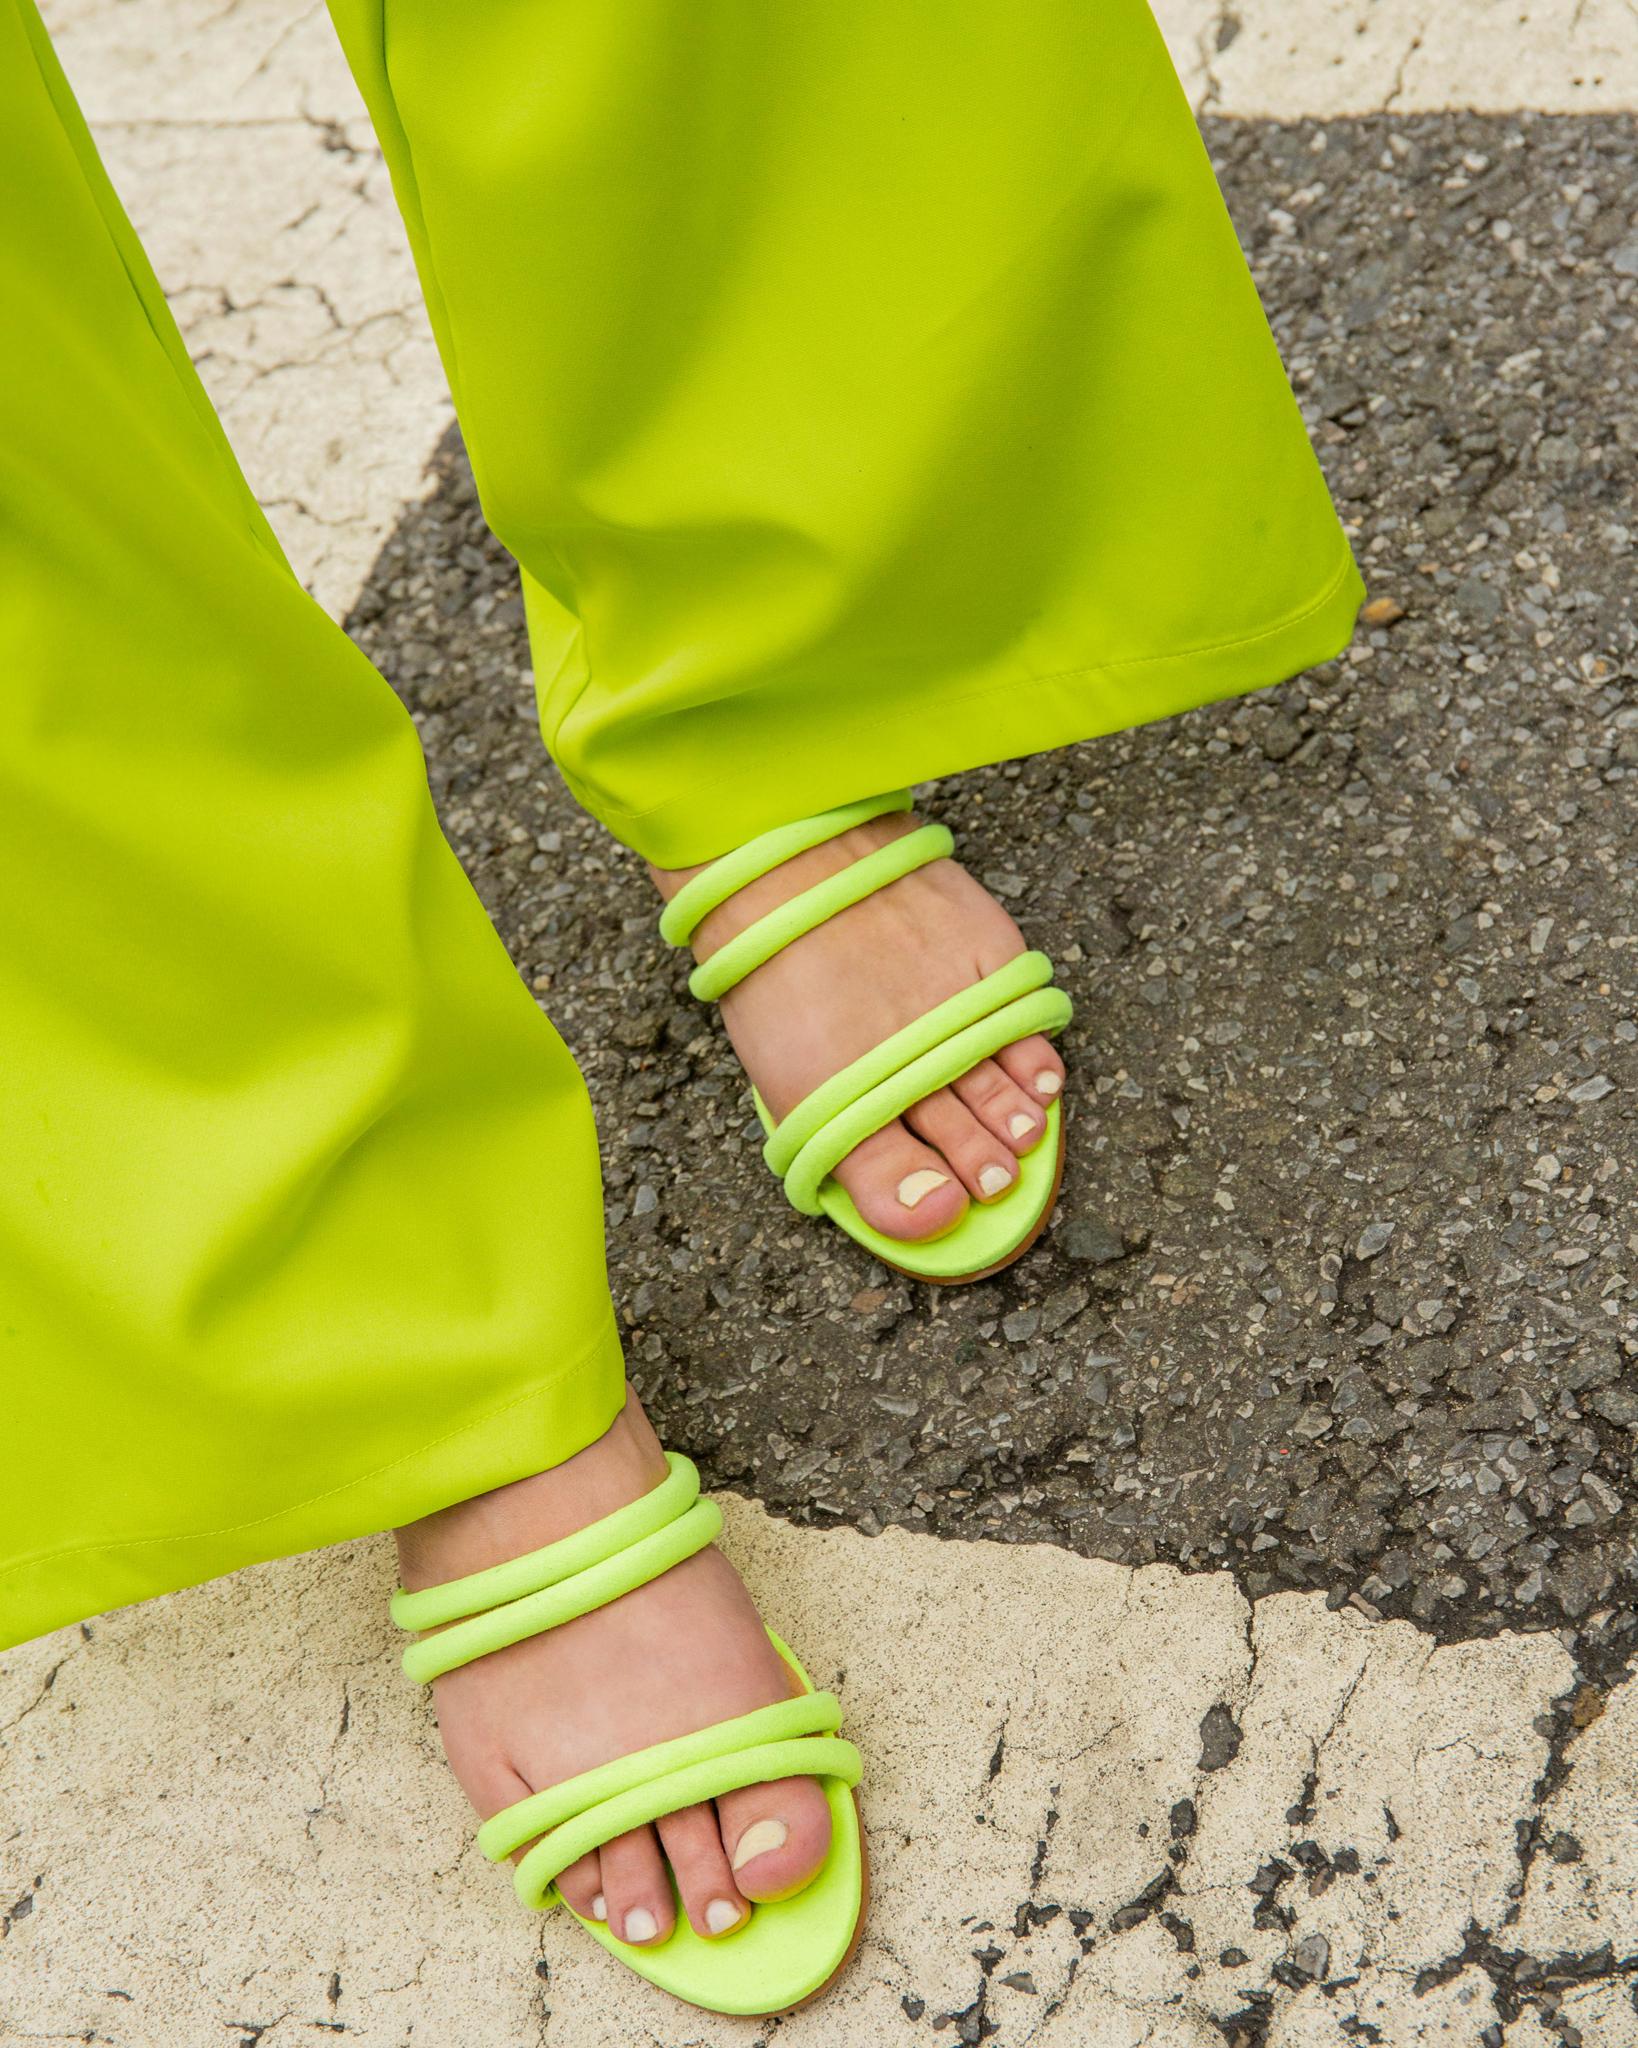 Neon summer sandals